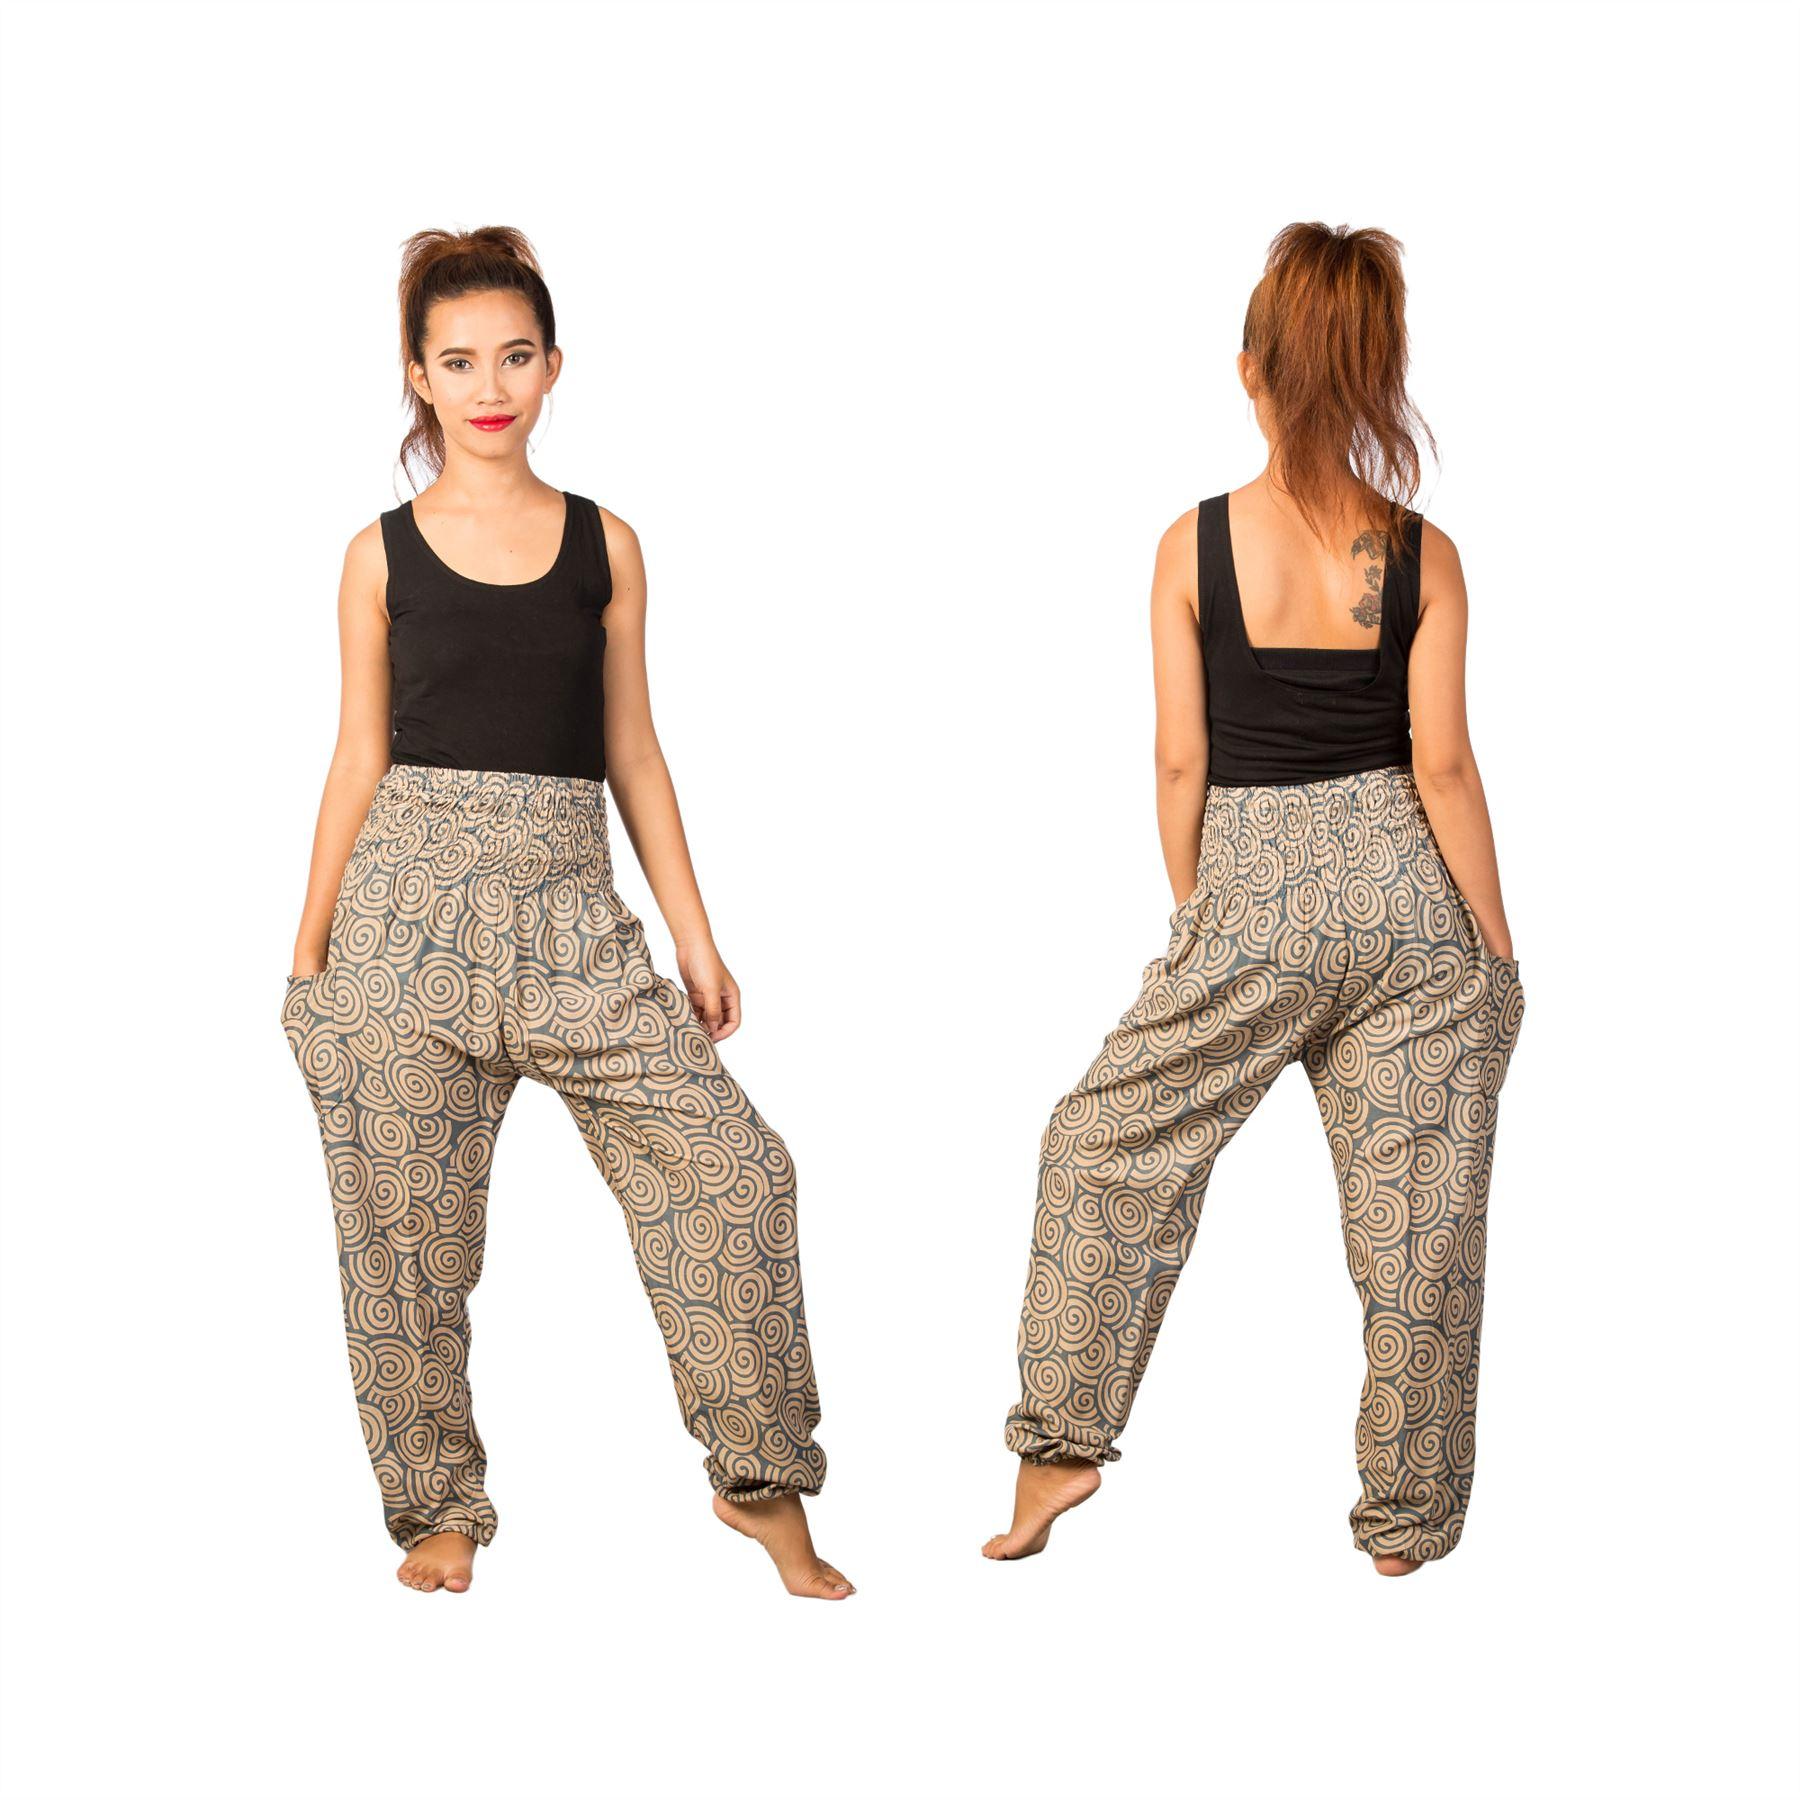 Lofbaz-Unisex-Pattern-Loose-Fit-Smock-Boho-Yoga-Active-Pants